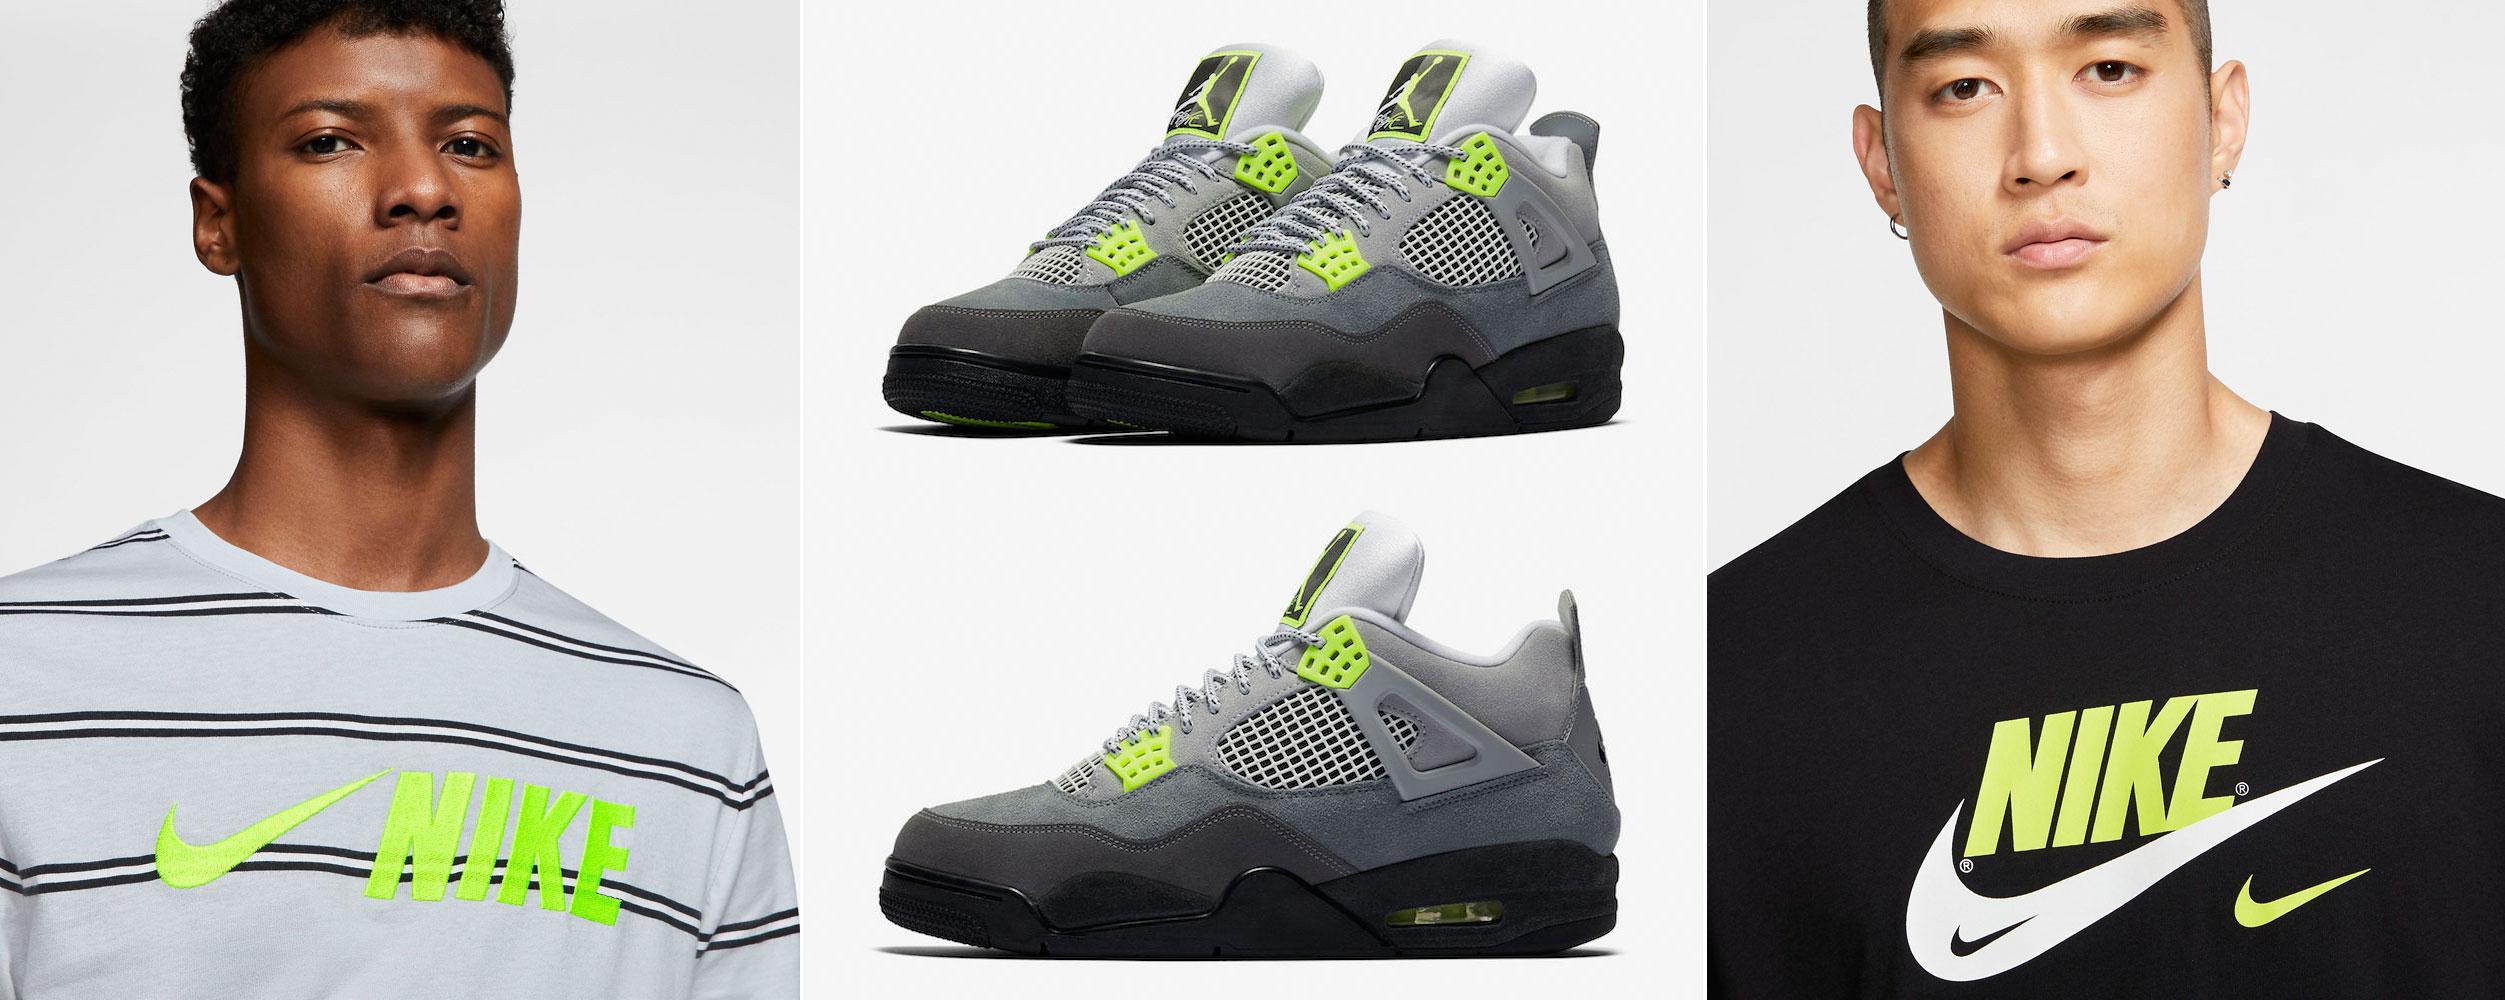 Air Jordan 4 Neon Volt Nike Shirts Sneakerfits Com